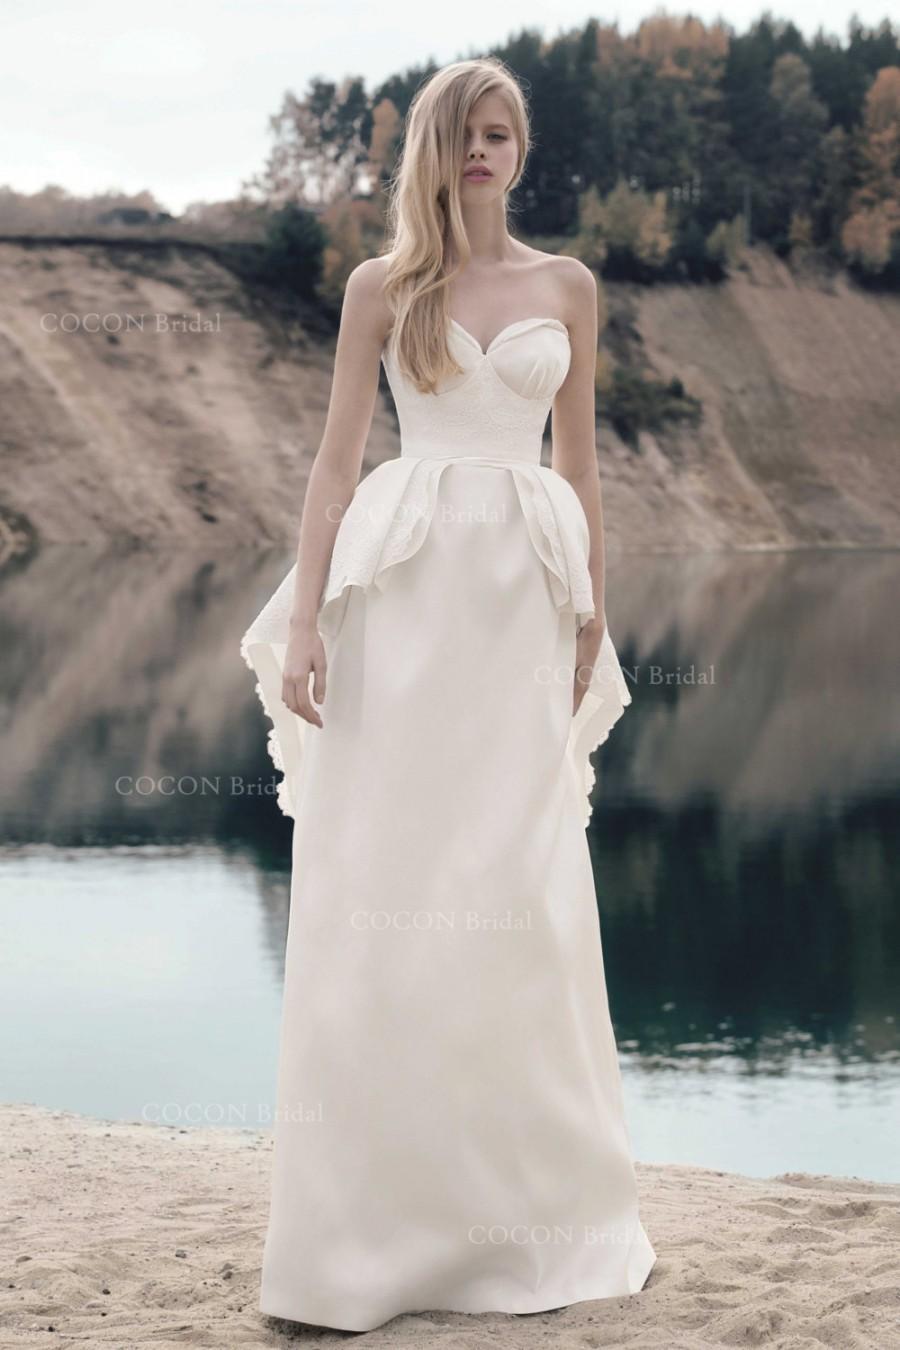 Designer Wedding Mikado Dress With Corded Lace Unusual Wedding Dress